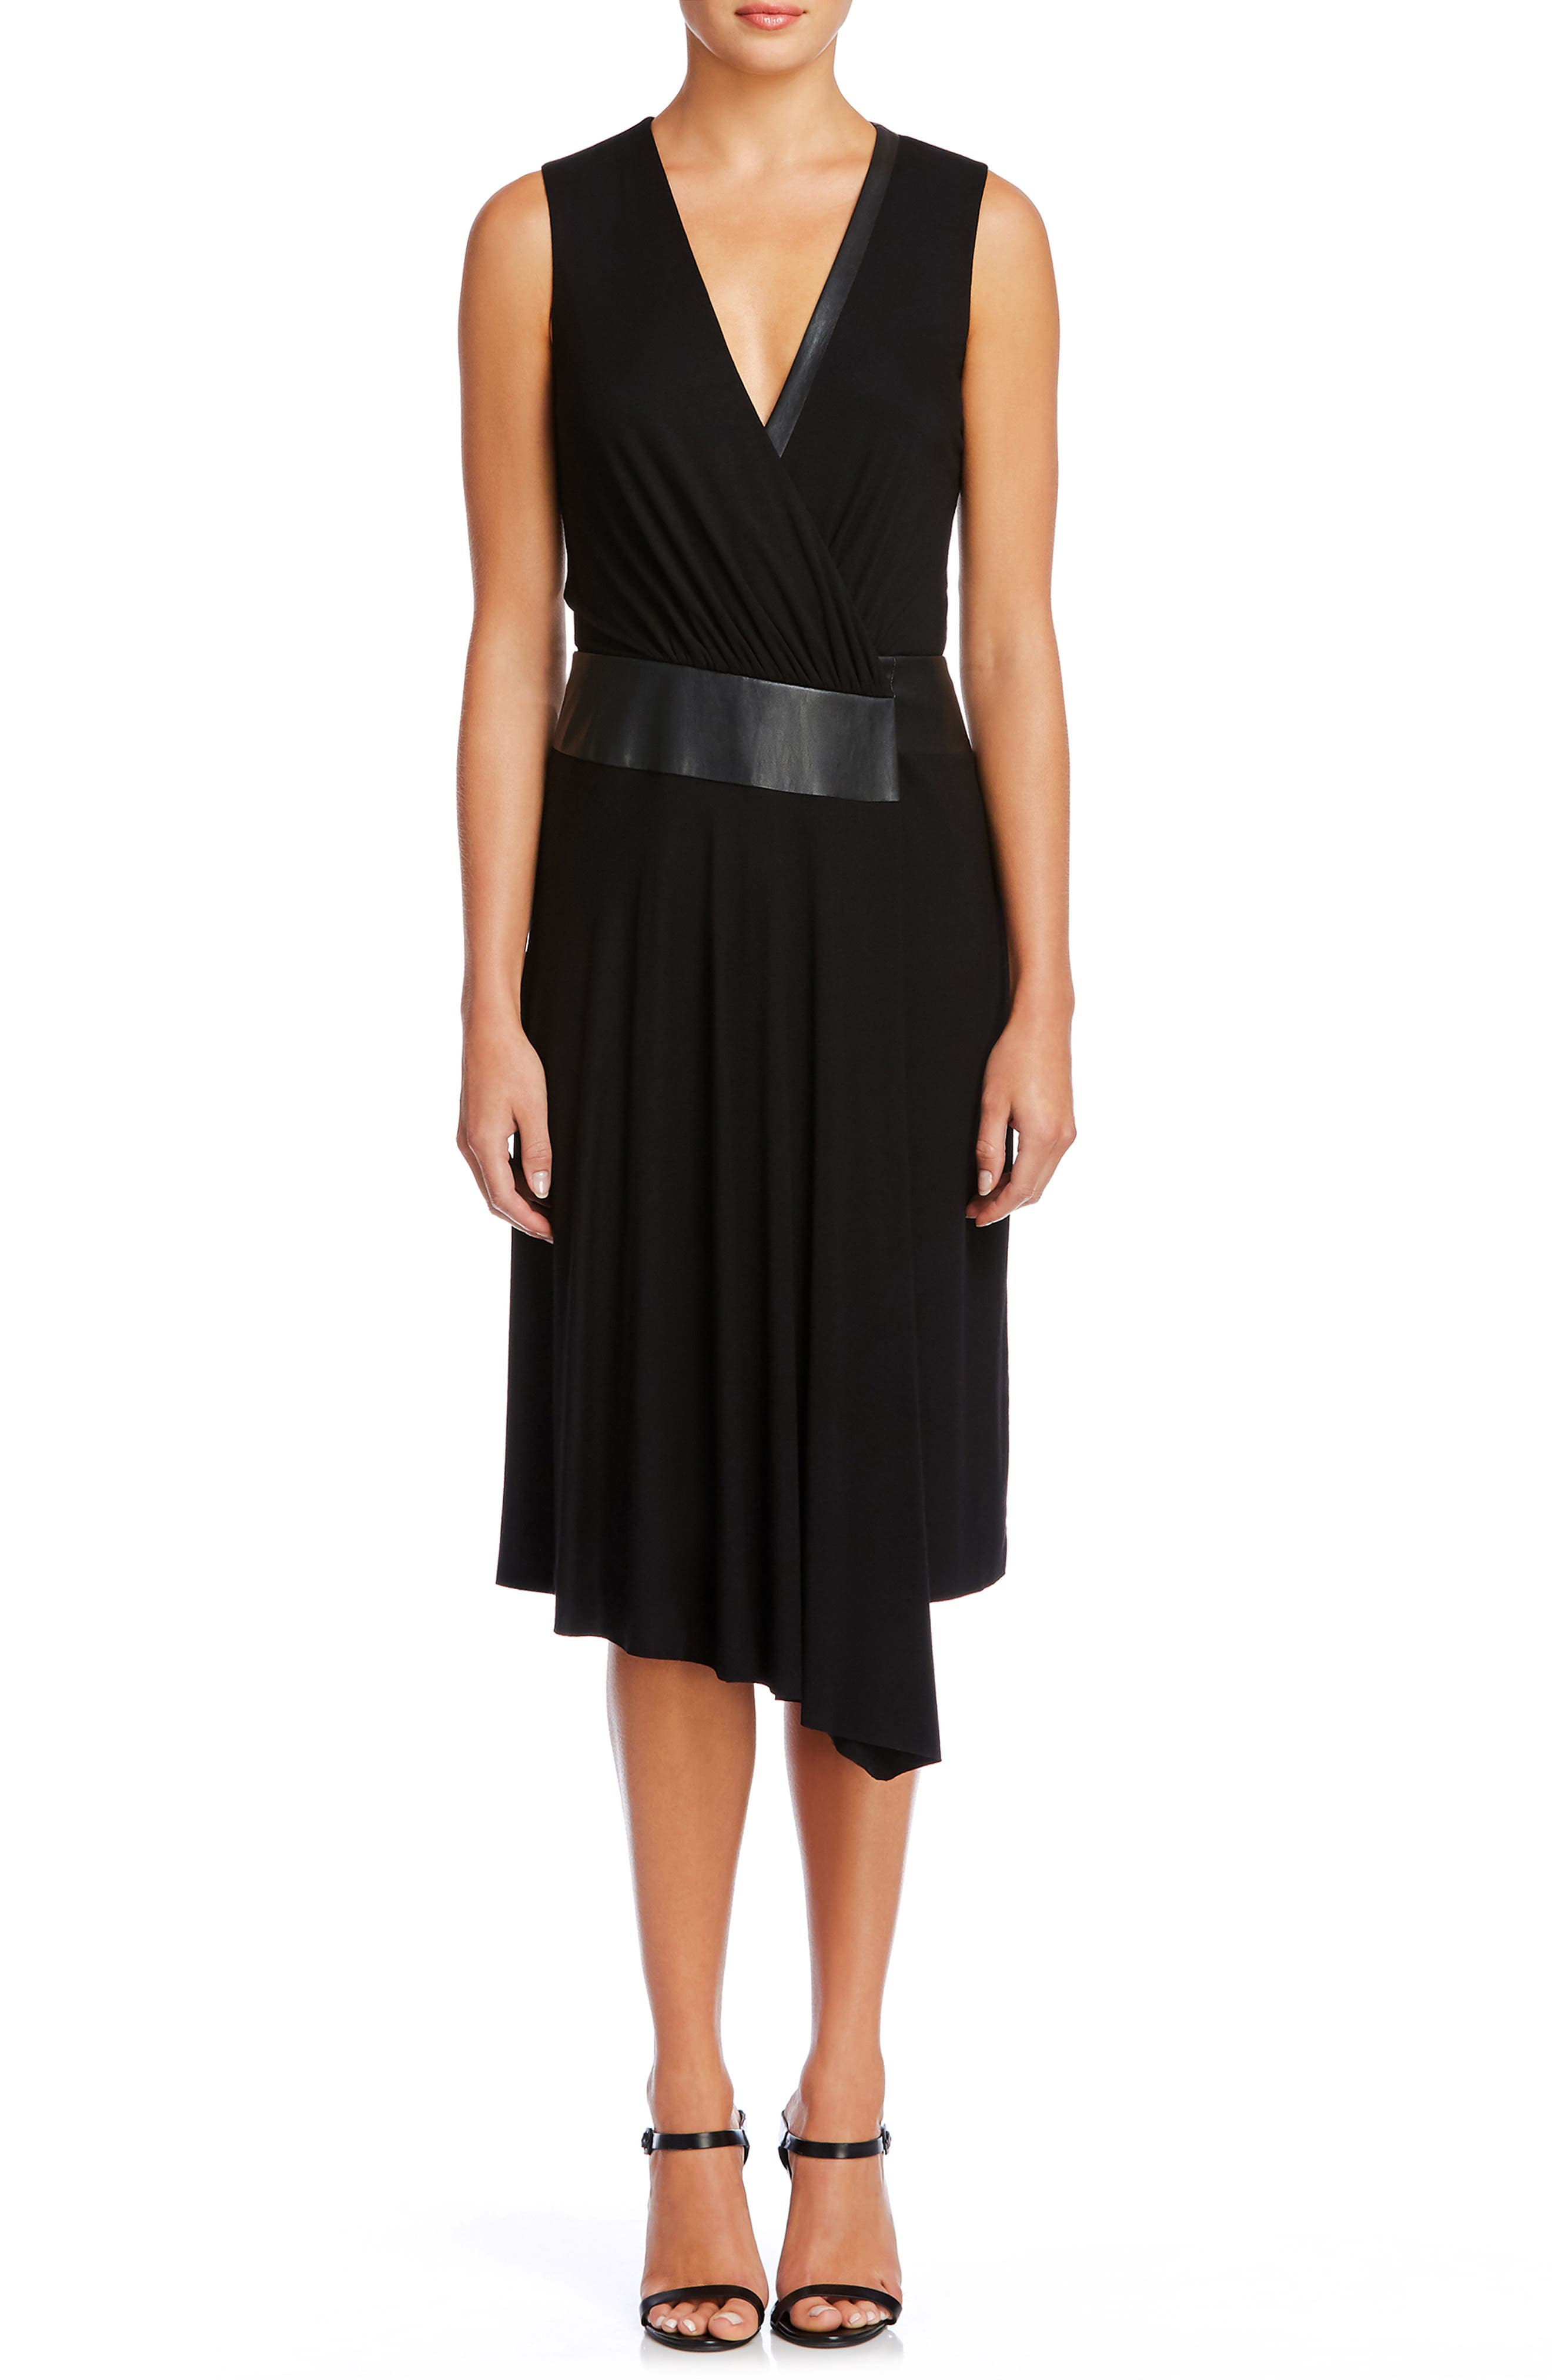 Sleeveless Faux Leather Dress